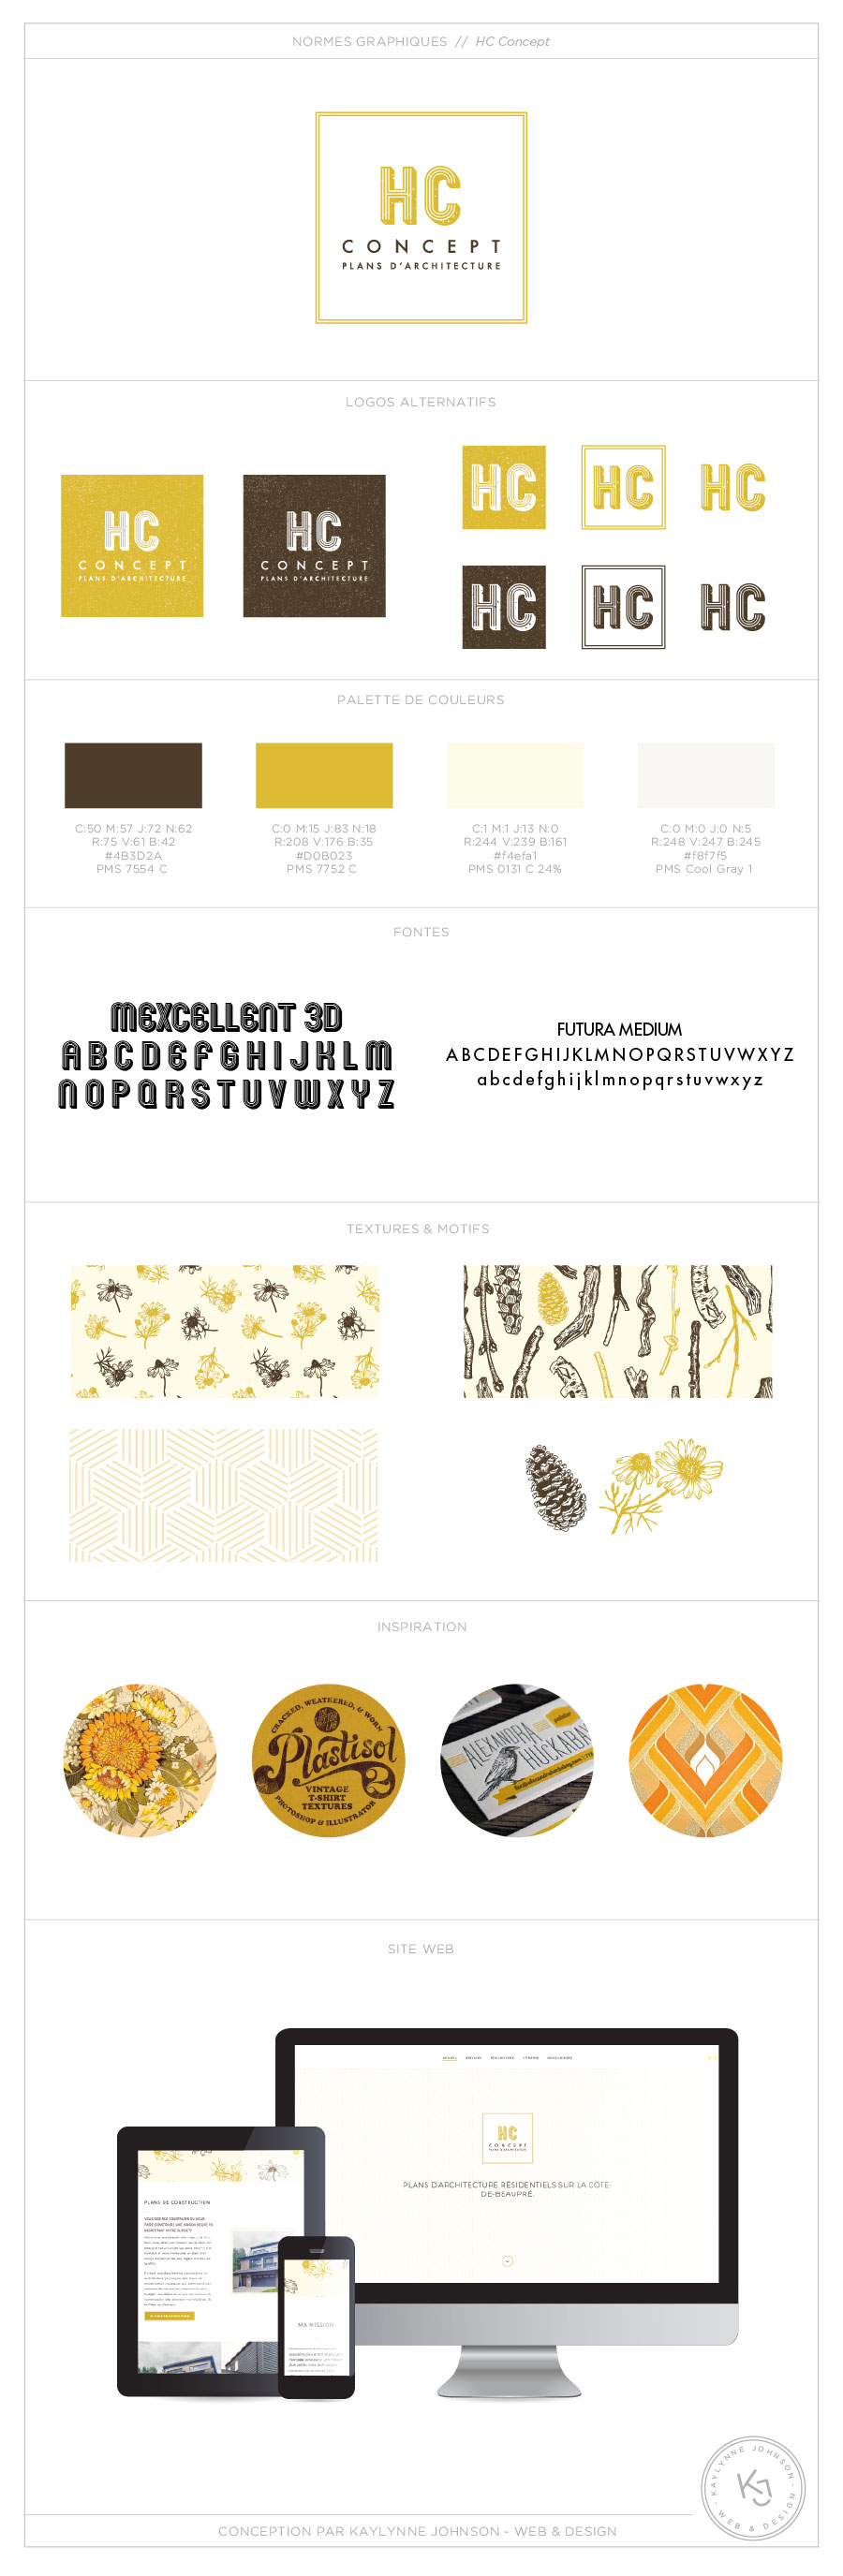 HC Concept - branding | Réalisé par Kaylynne Johnson - web & design | www.kaylynnejohnson.com